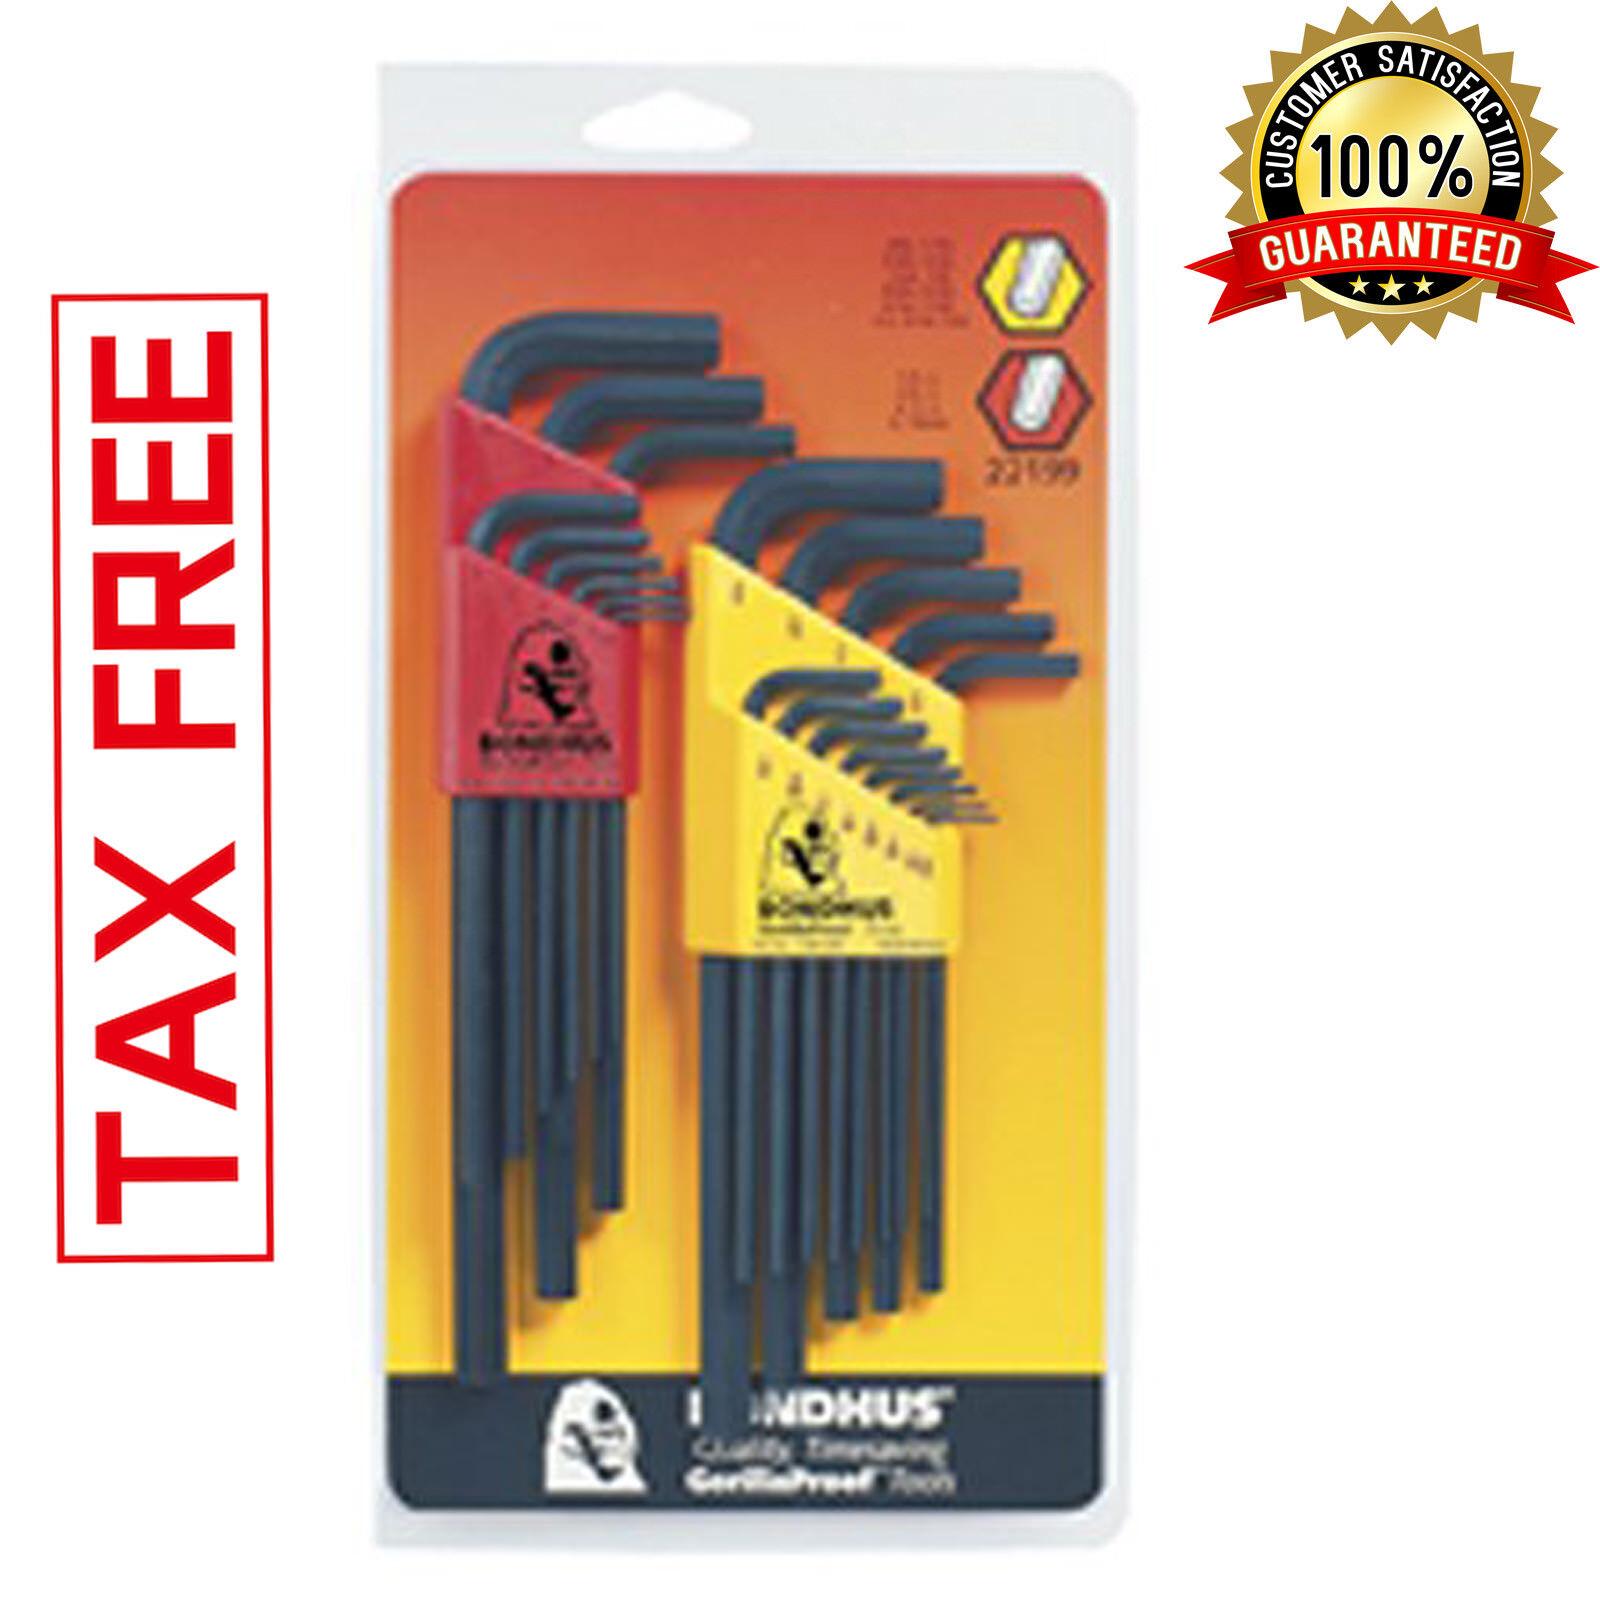 Hex Key Allen Sae Metric Wrench Bit Kit Long Socket Tool L W